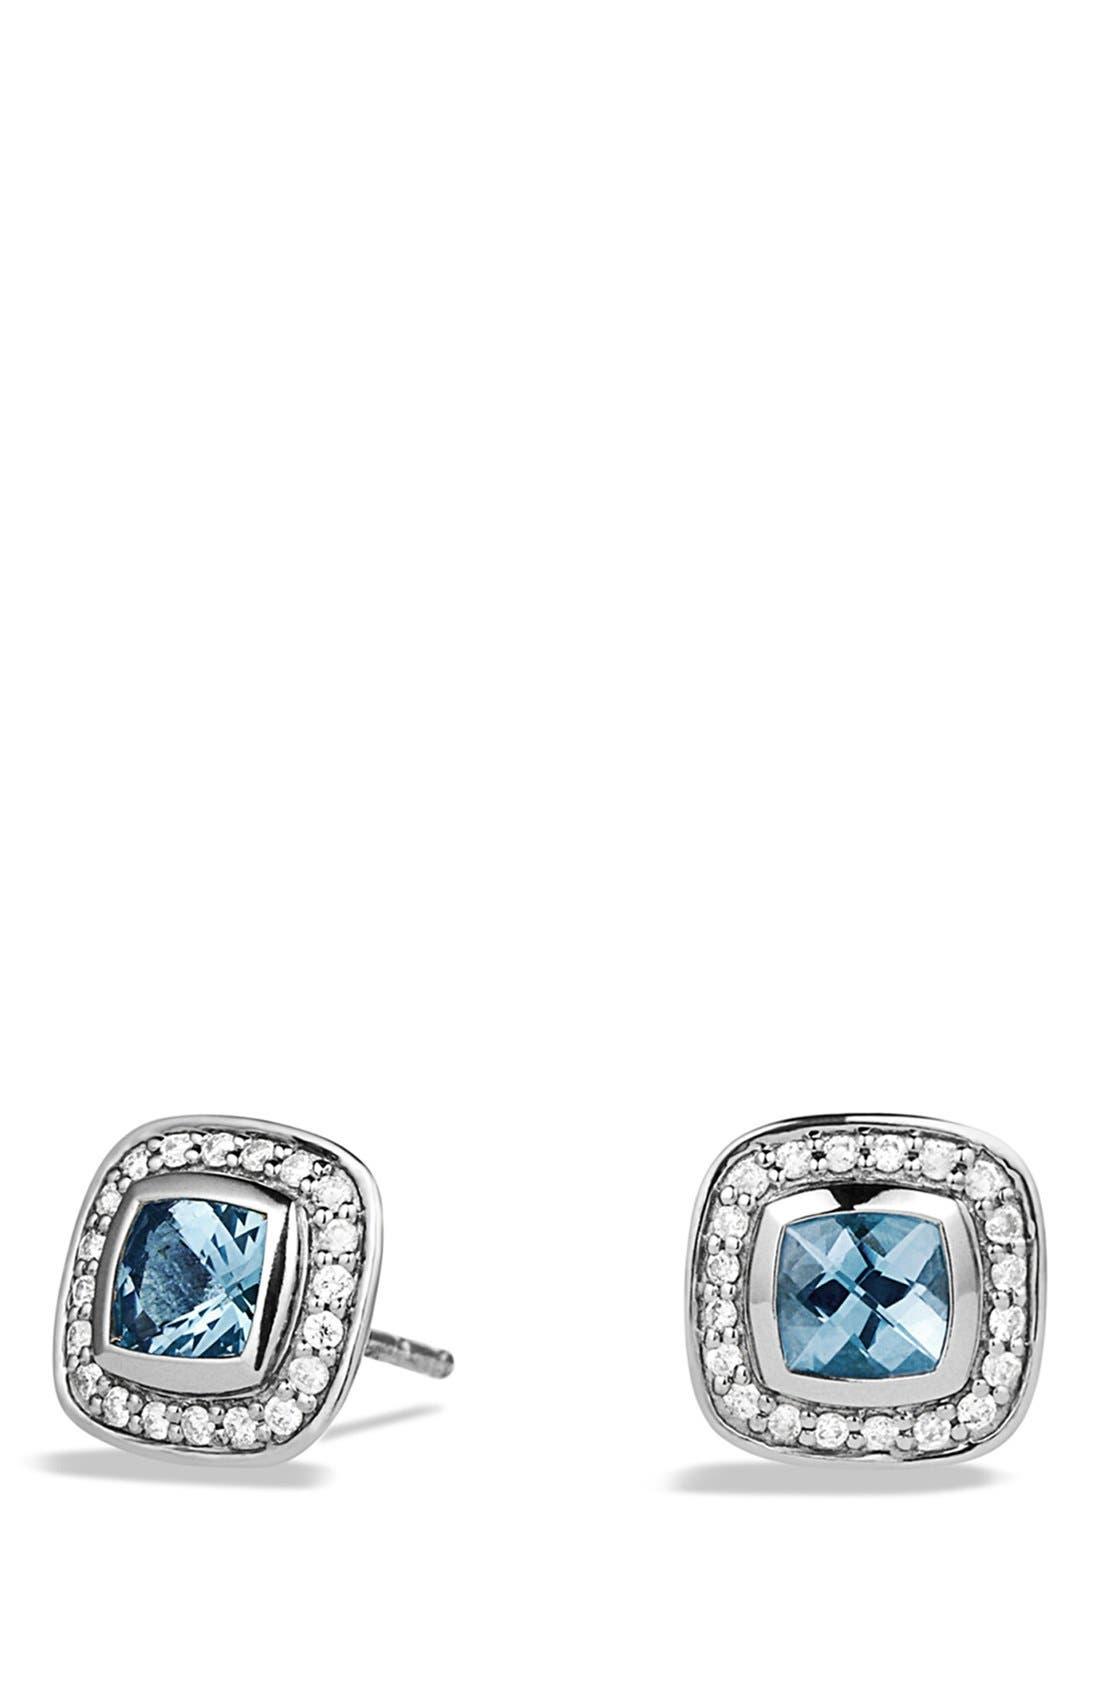 'Albion' Petite Earrings with Diamonds,                             Main thumbnail 1, color,                             BLUE TOPAZ